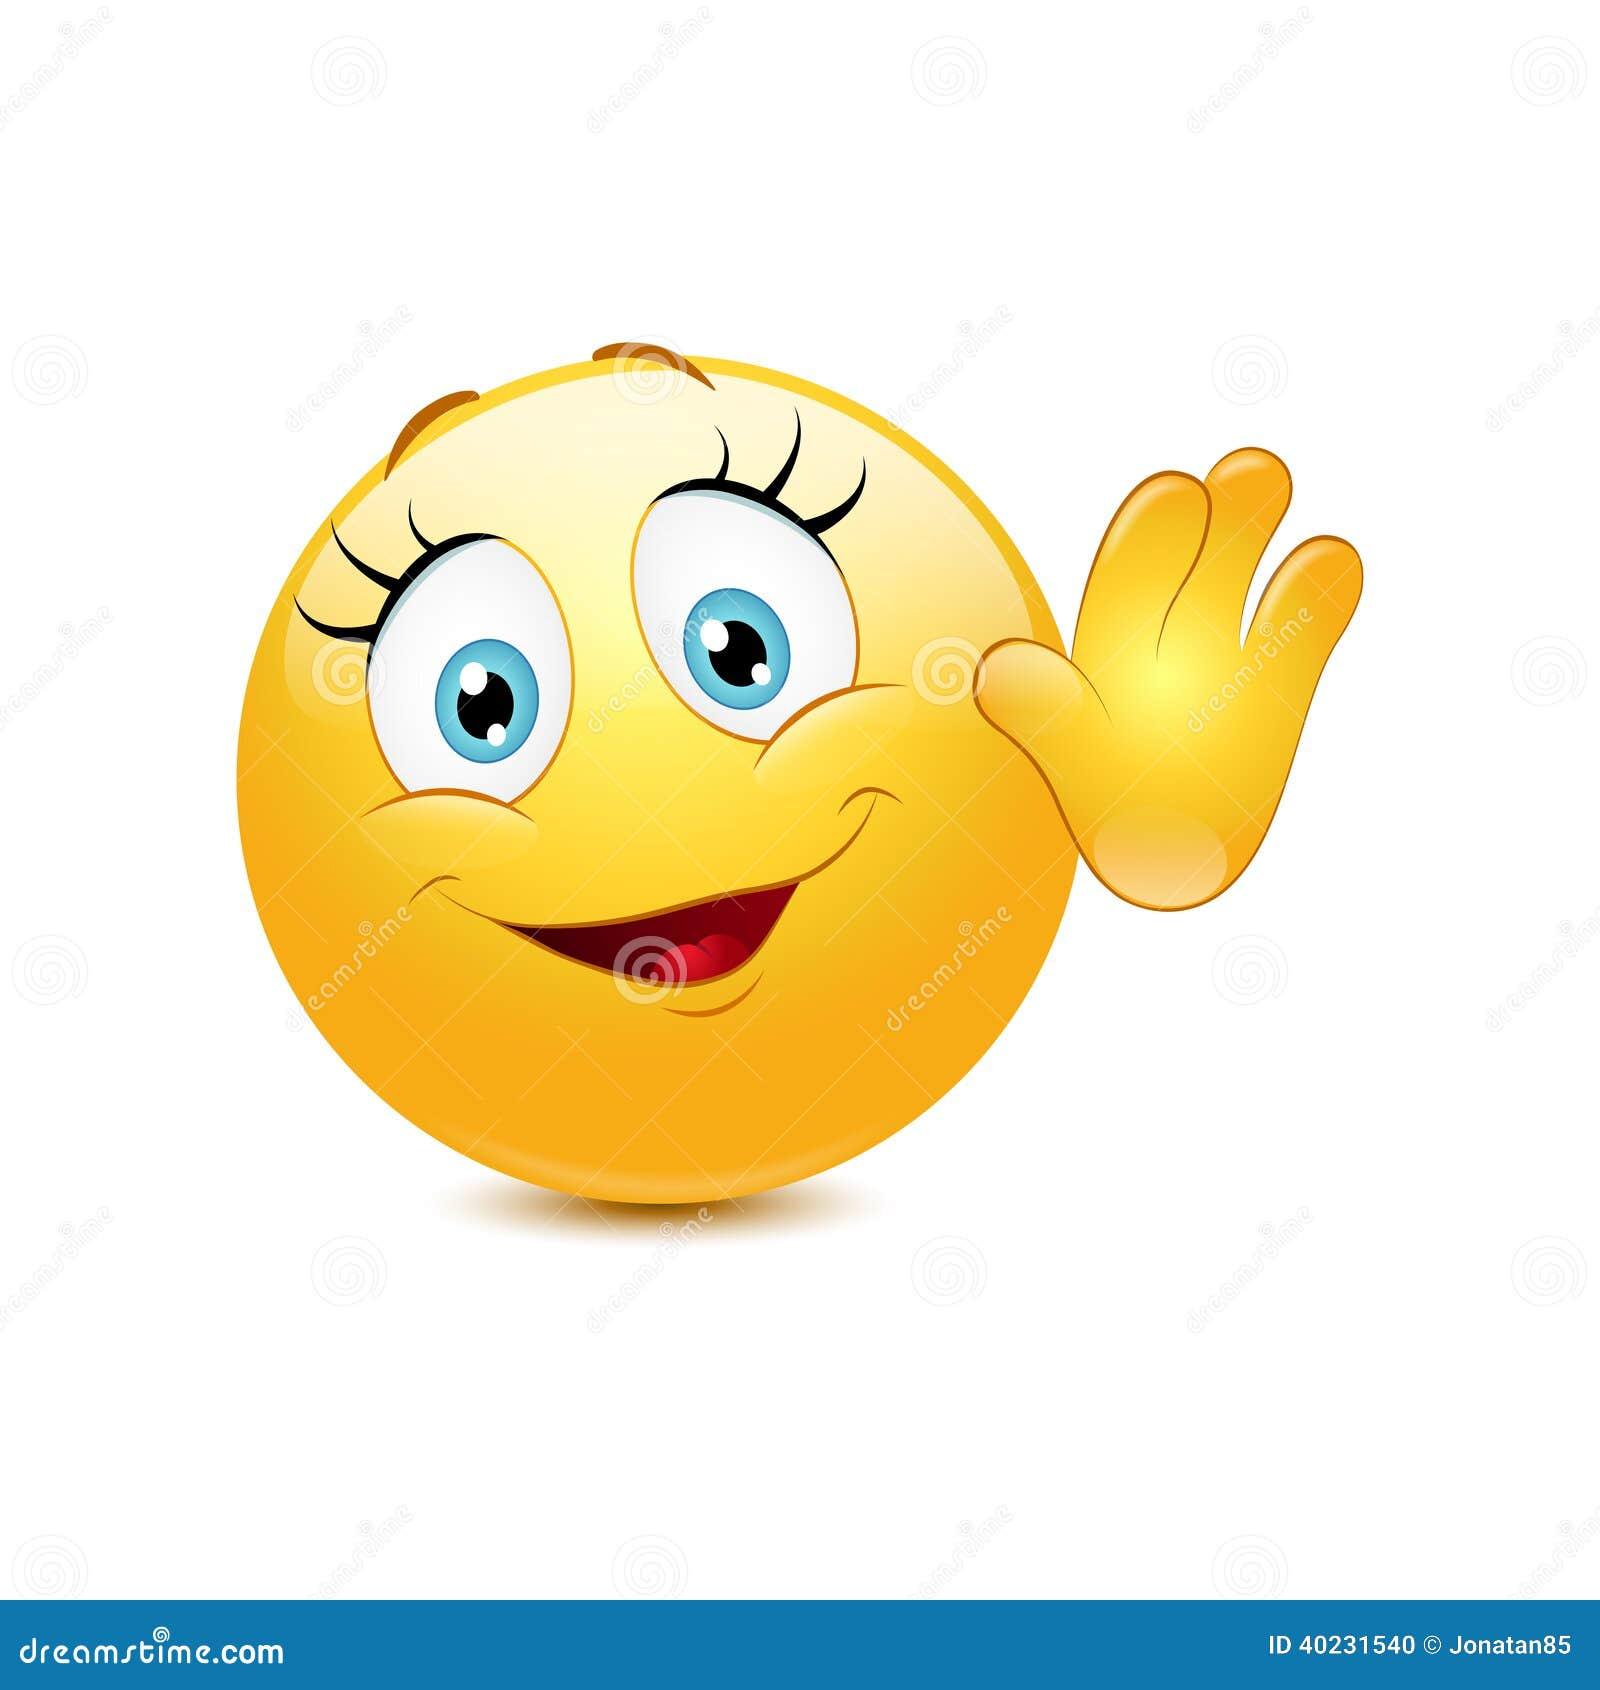 hallo smiley stock illustrationen  vektors   u0026 klipart  u2013  291 stock illustrations